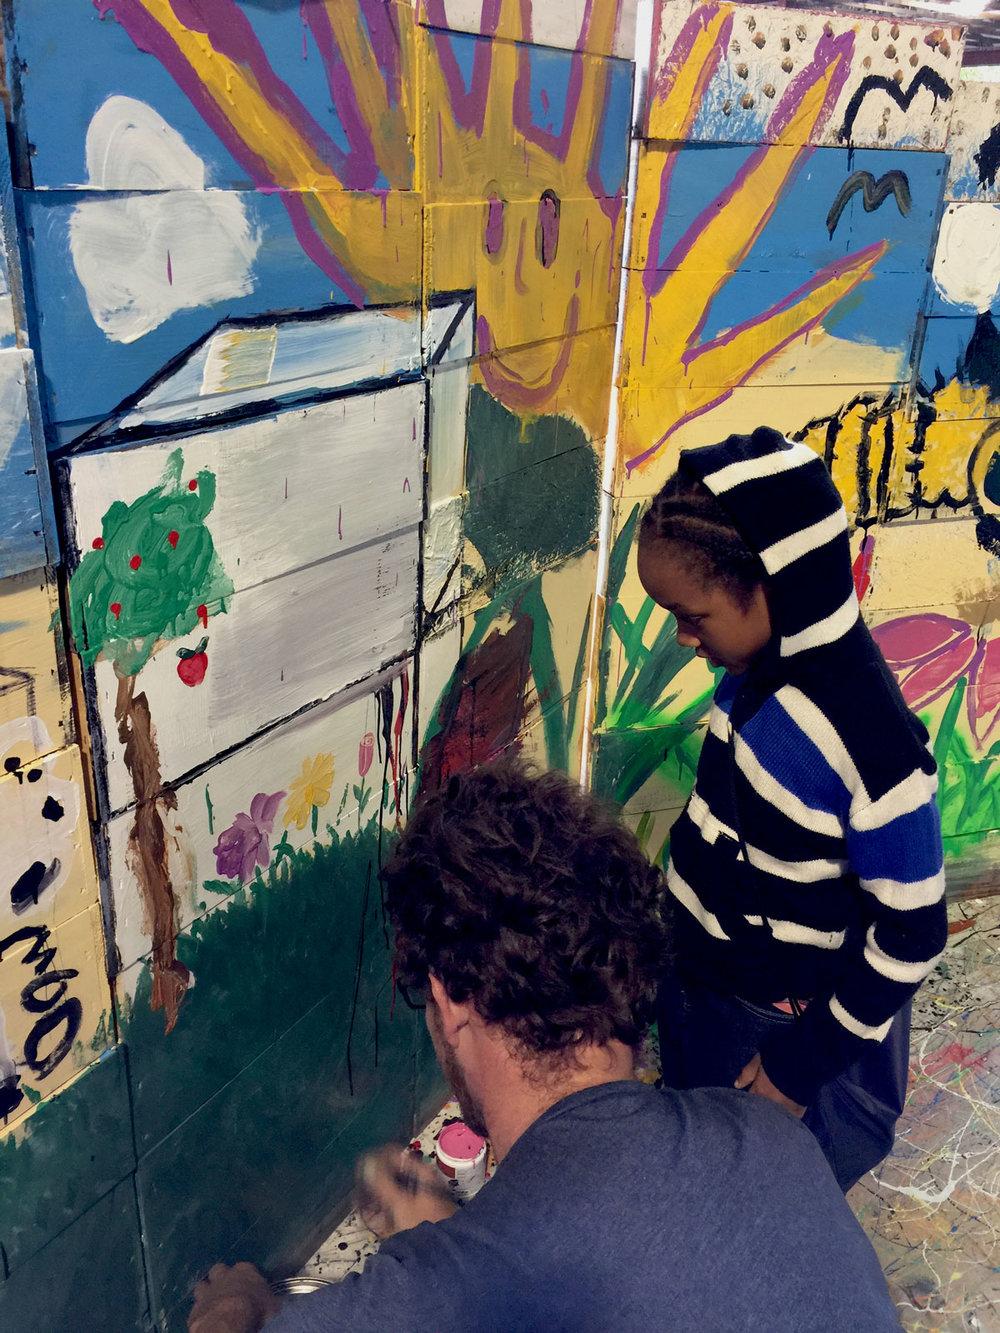 Kids-Paint-6.jpg